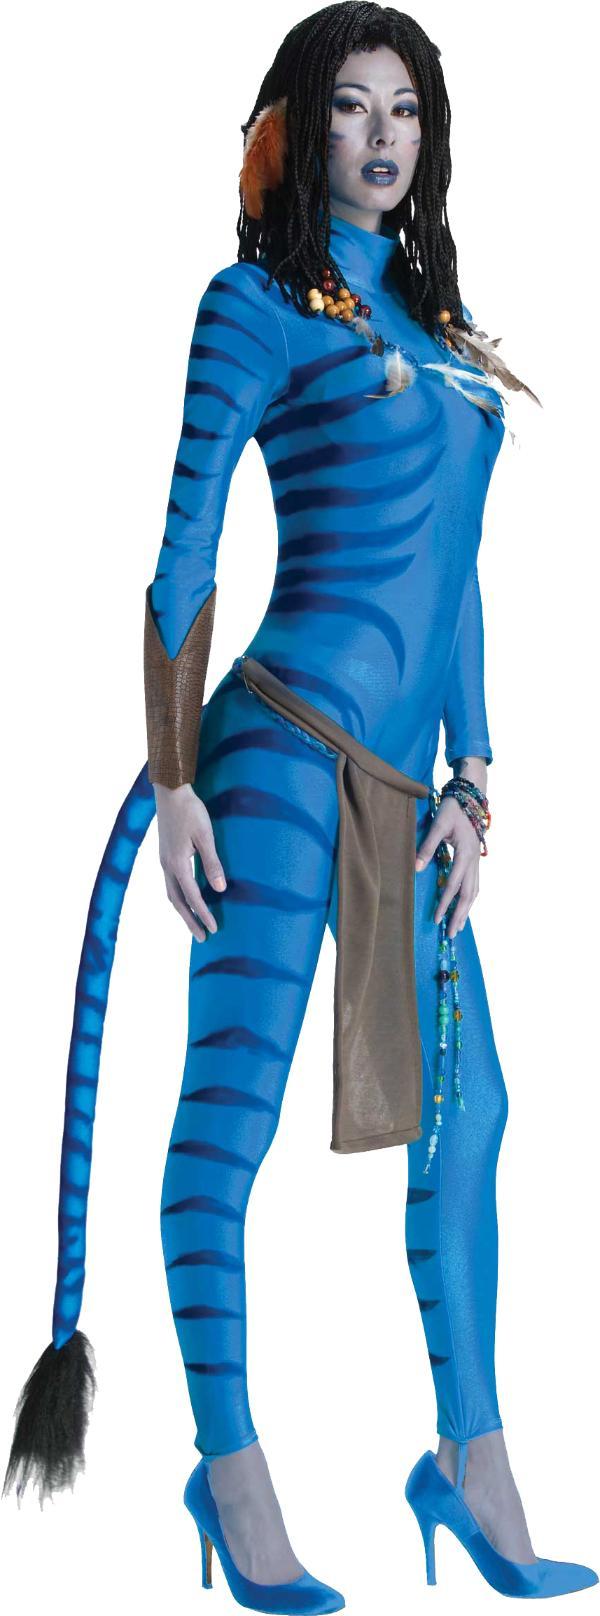 Costume-Avatar-Neytiri-donna-Carnevale-Cod-174140